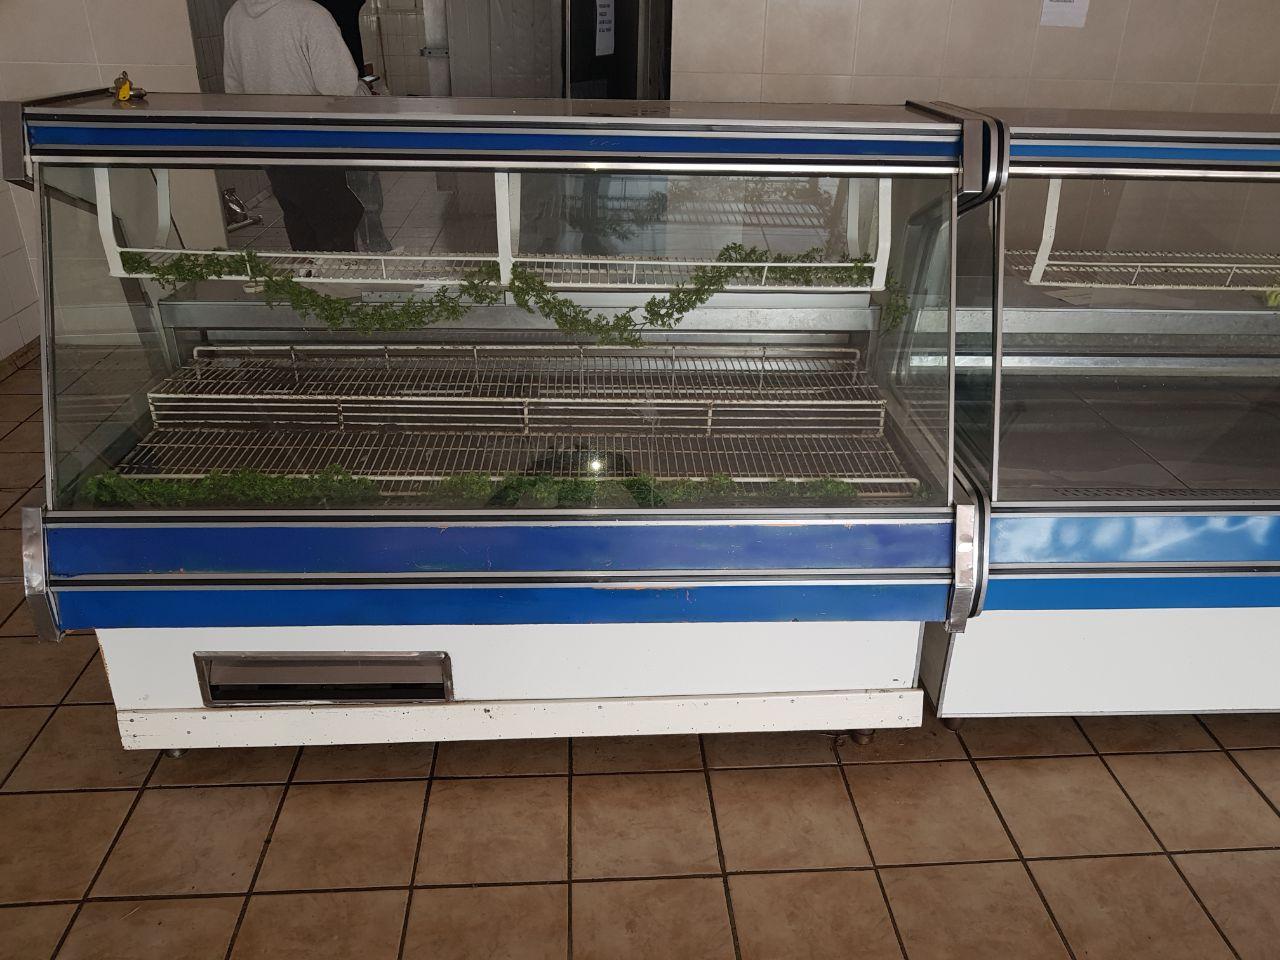 Butchery Kitchen Equipment : Selling Large Display Fridges - WORKING Junk Mail